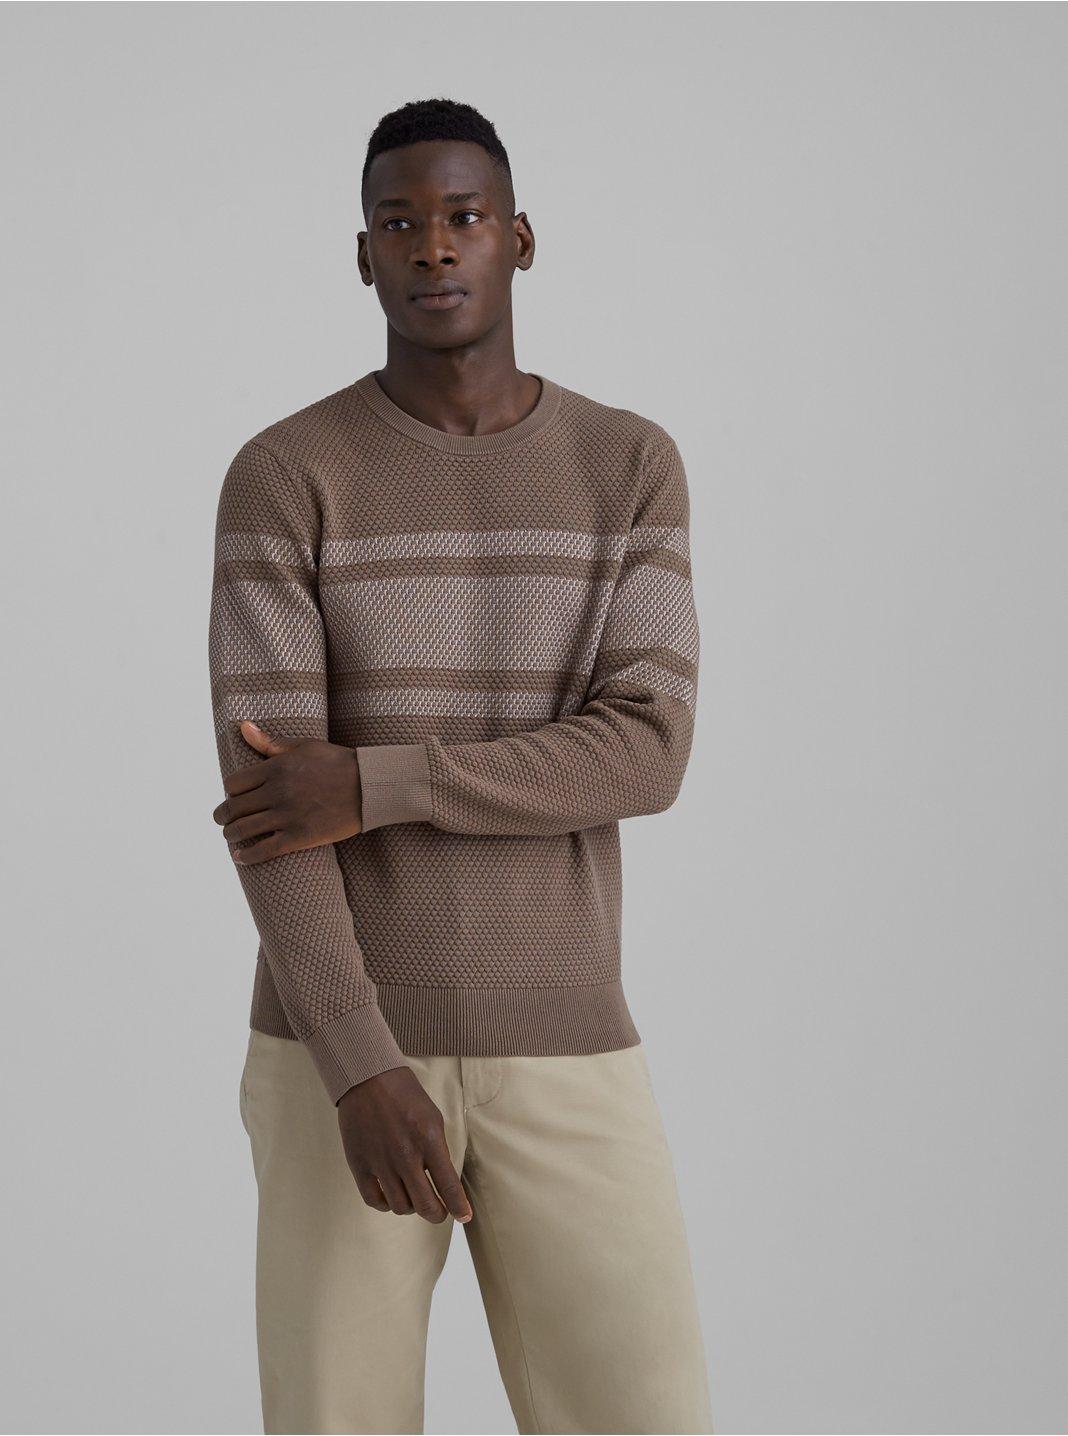 Honeycomb Striped Crewneck Sweater